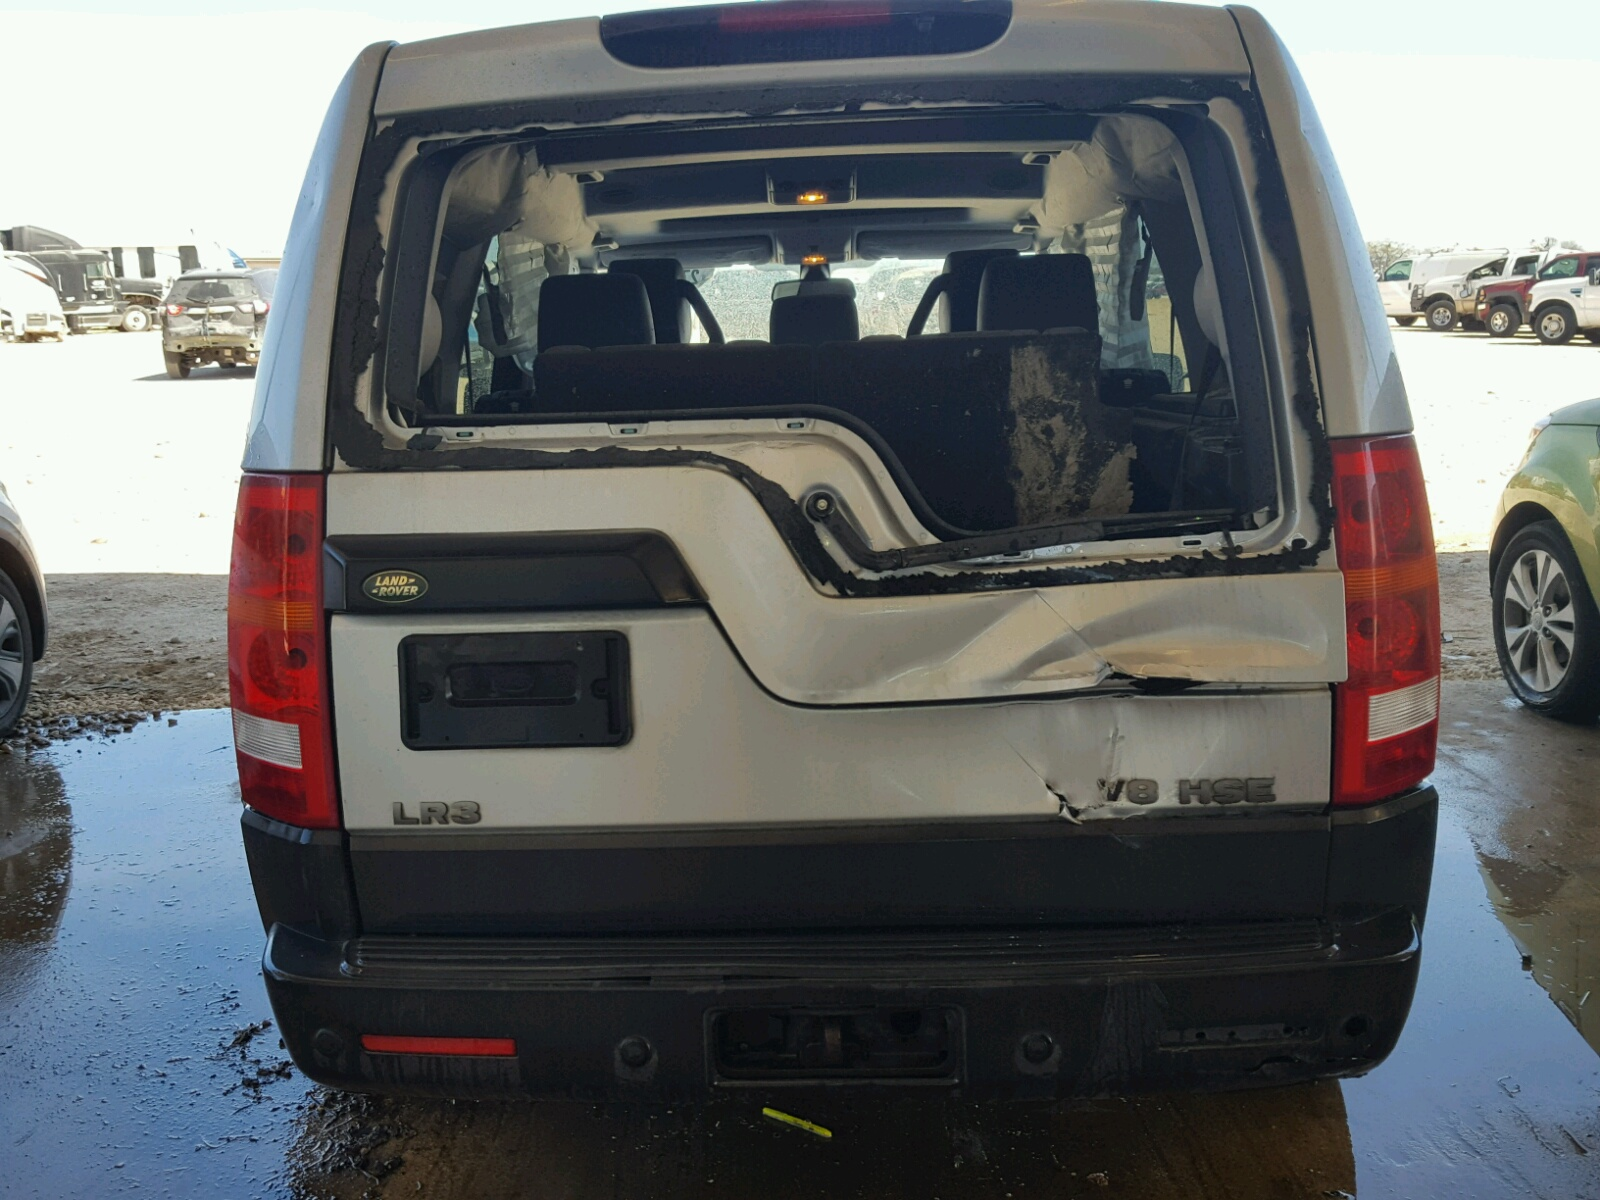 on receipt land copart carfinder rover auto lot landrover en online junk vin rove ended hse hayward auction auctions ca range for sale